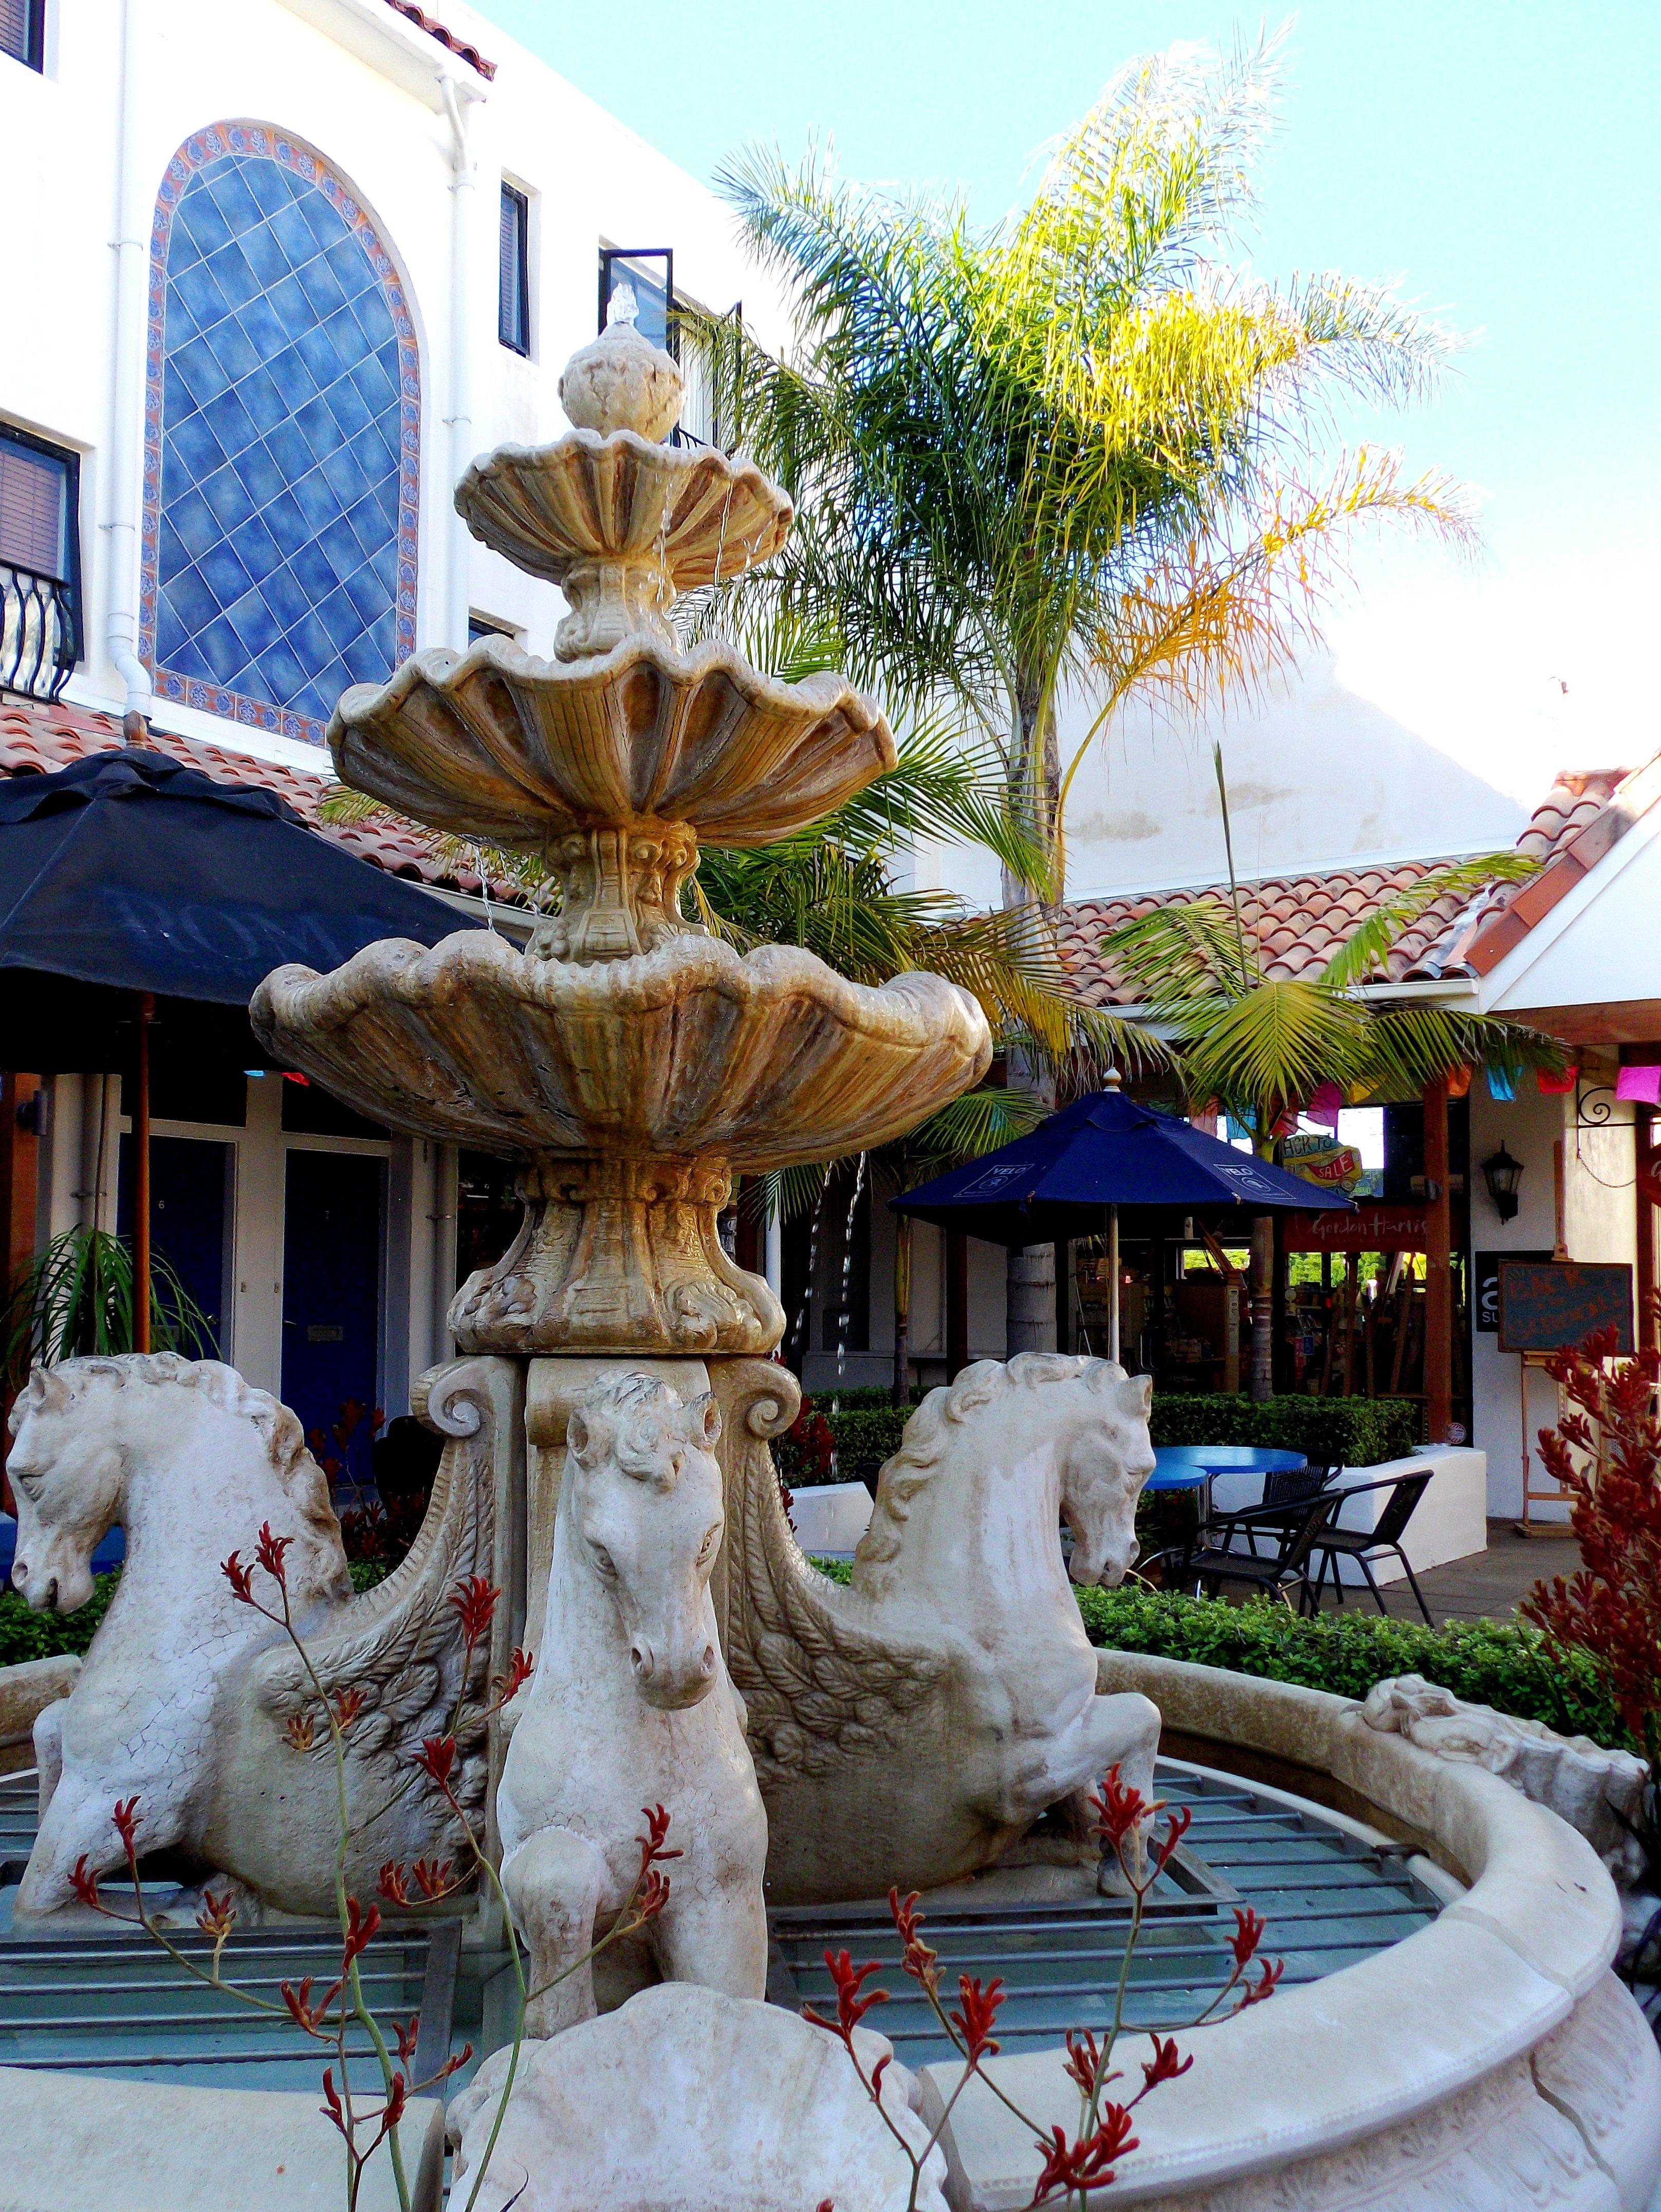 89486e369406feff6155c3c5011843f4 - Hamilton Gardens New Zealand Alice In Wonderland